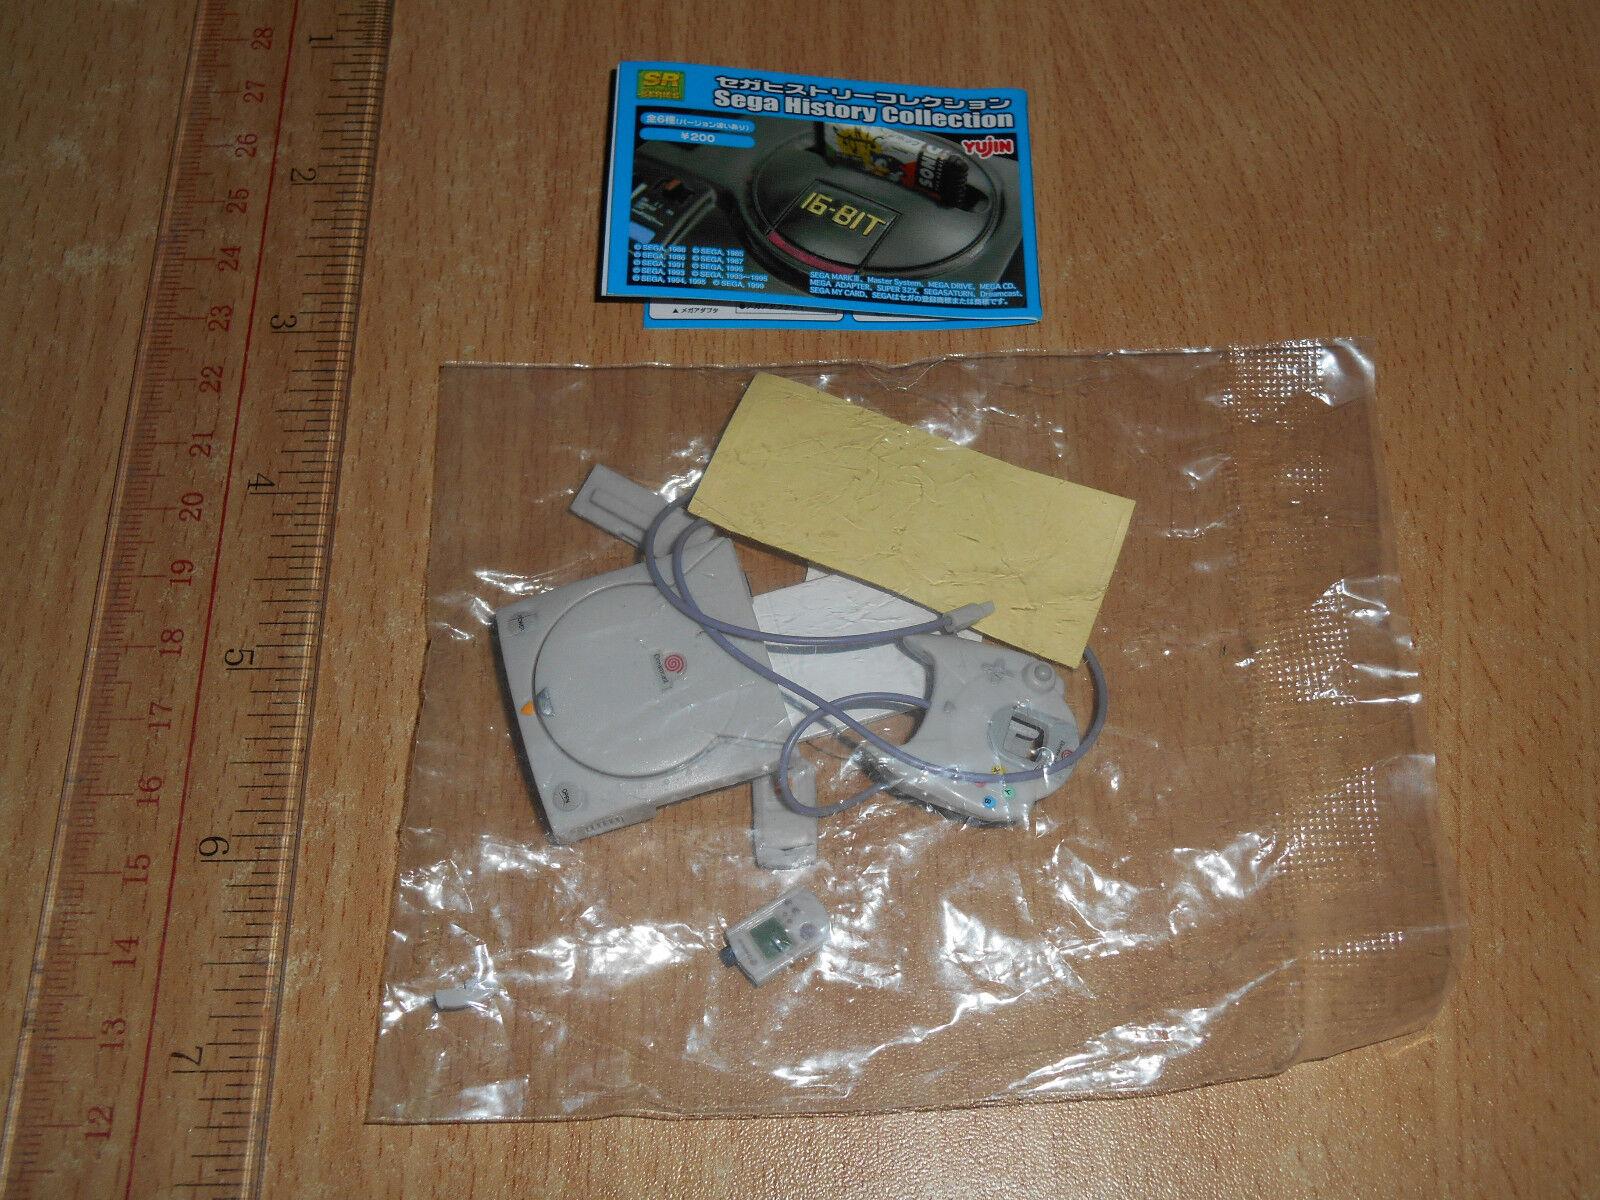 Yujin SR Sega History Collection Gashapon Gashapon Gashapon Dreamcast ac4f9c